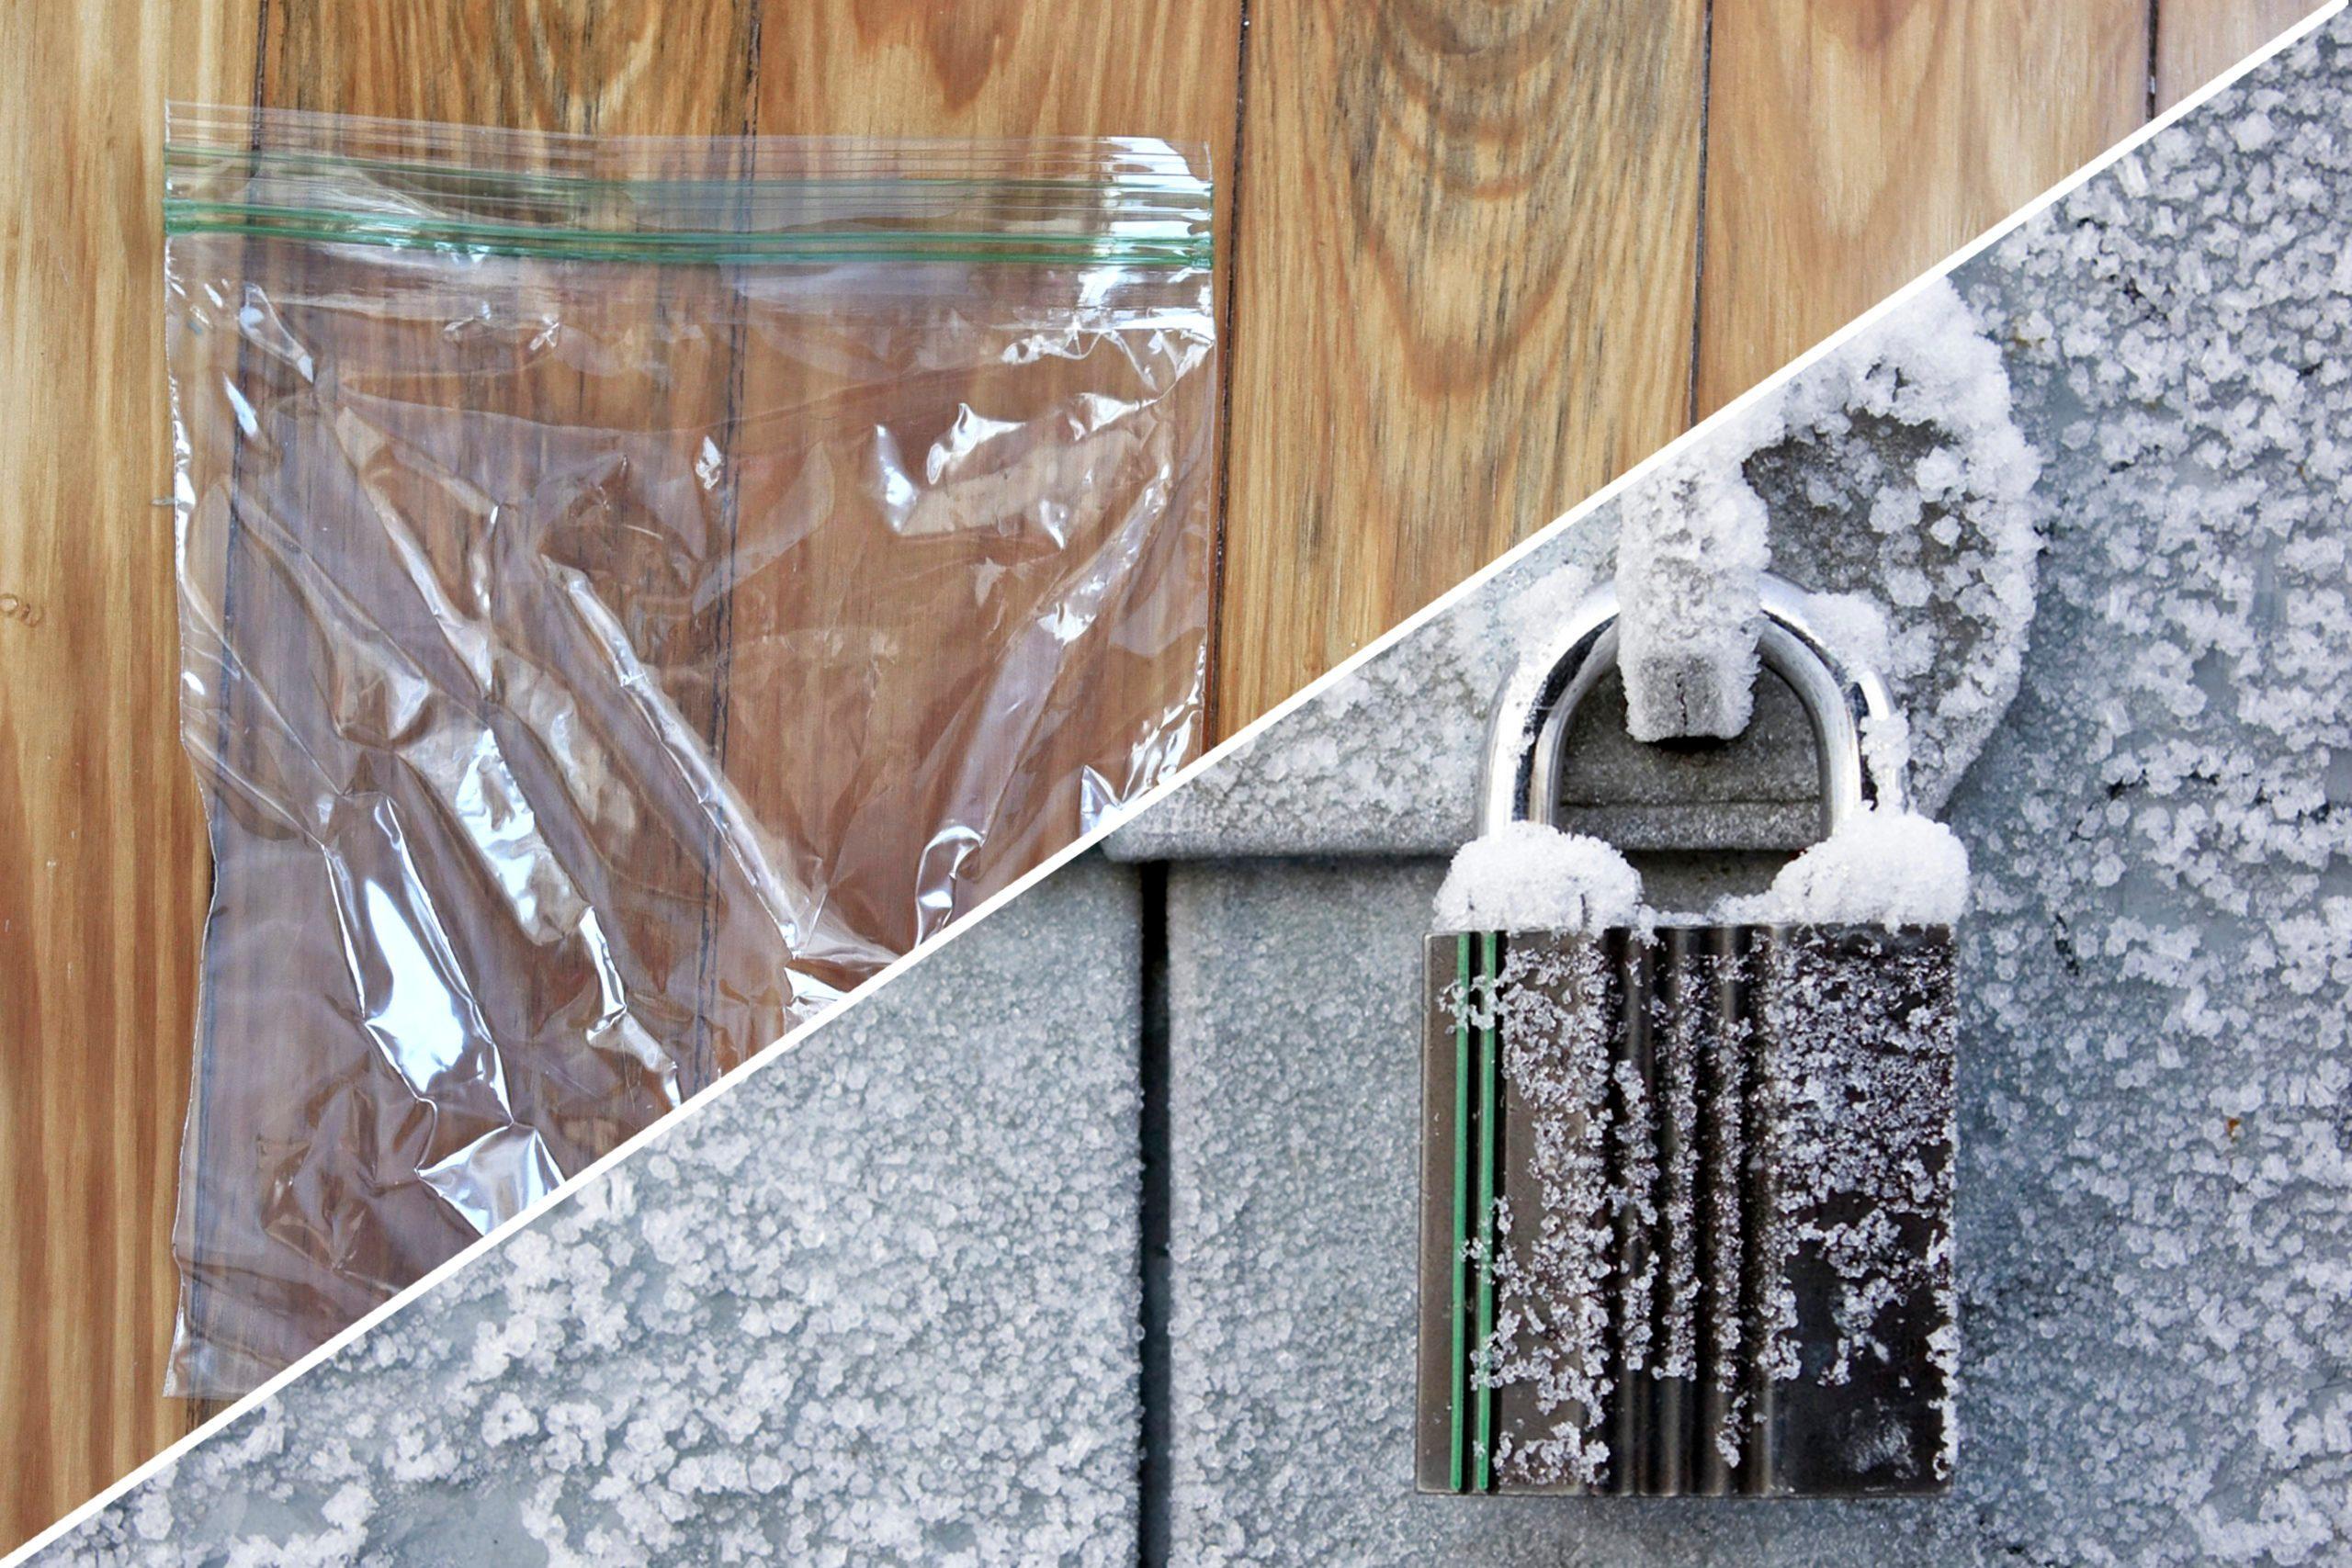 reusable plastic bag frozen padlock